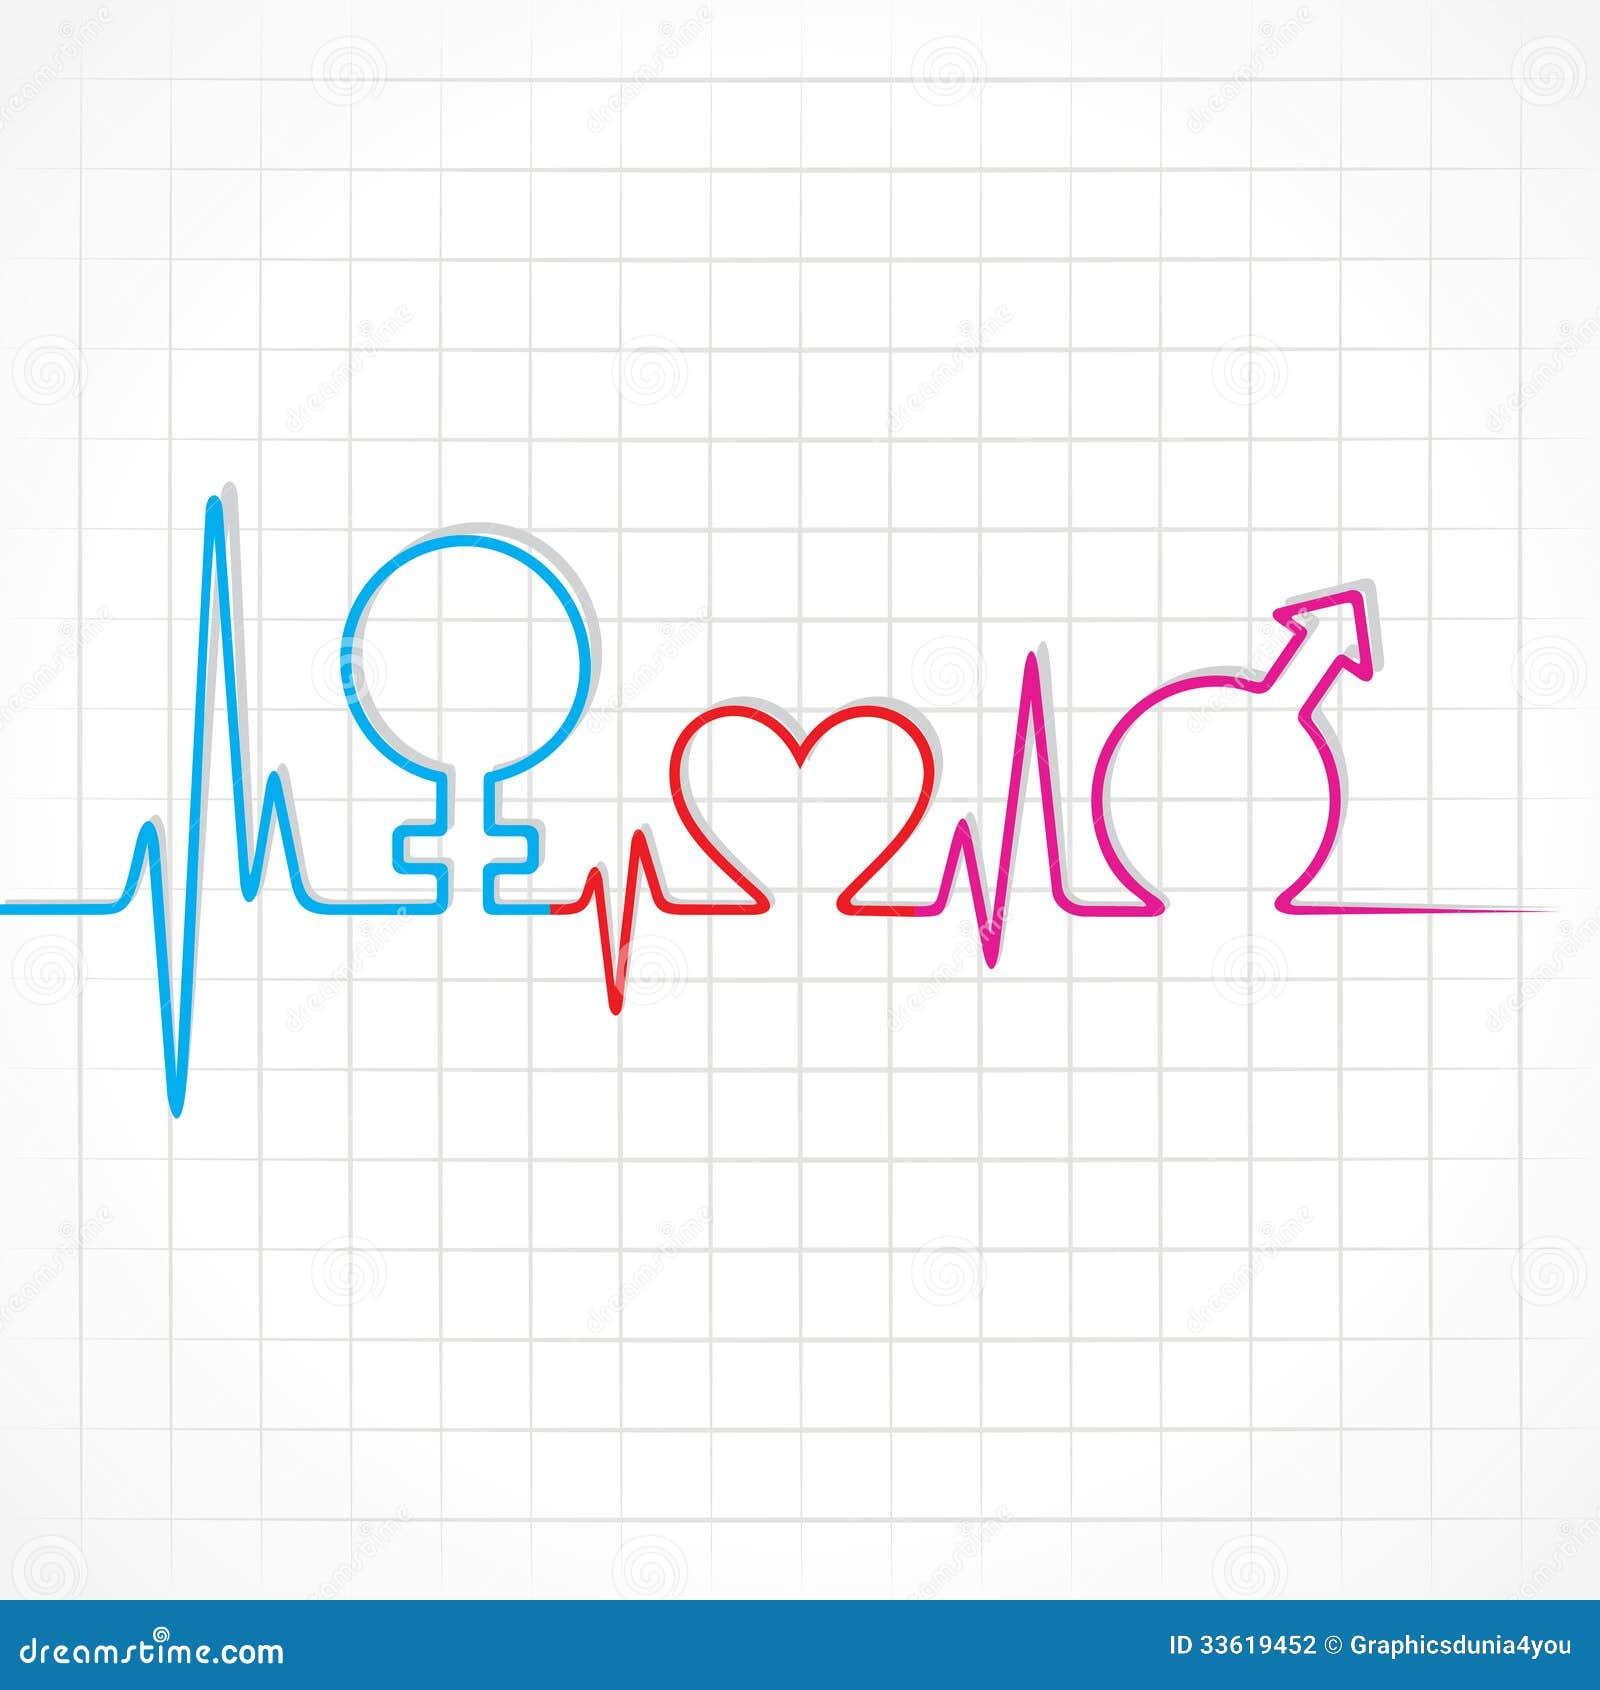 Heartbeat Make Malefemale And Heart Symbol At Lea Stock Vector